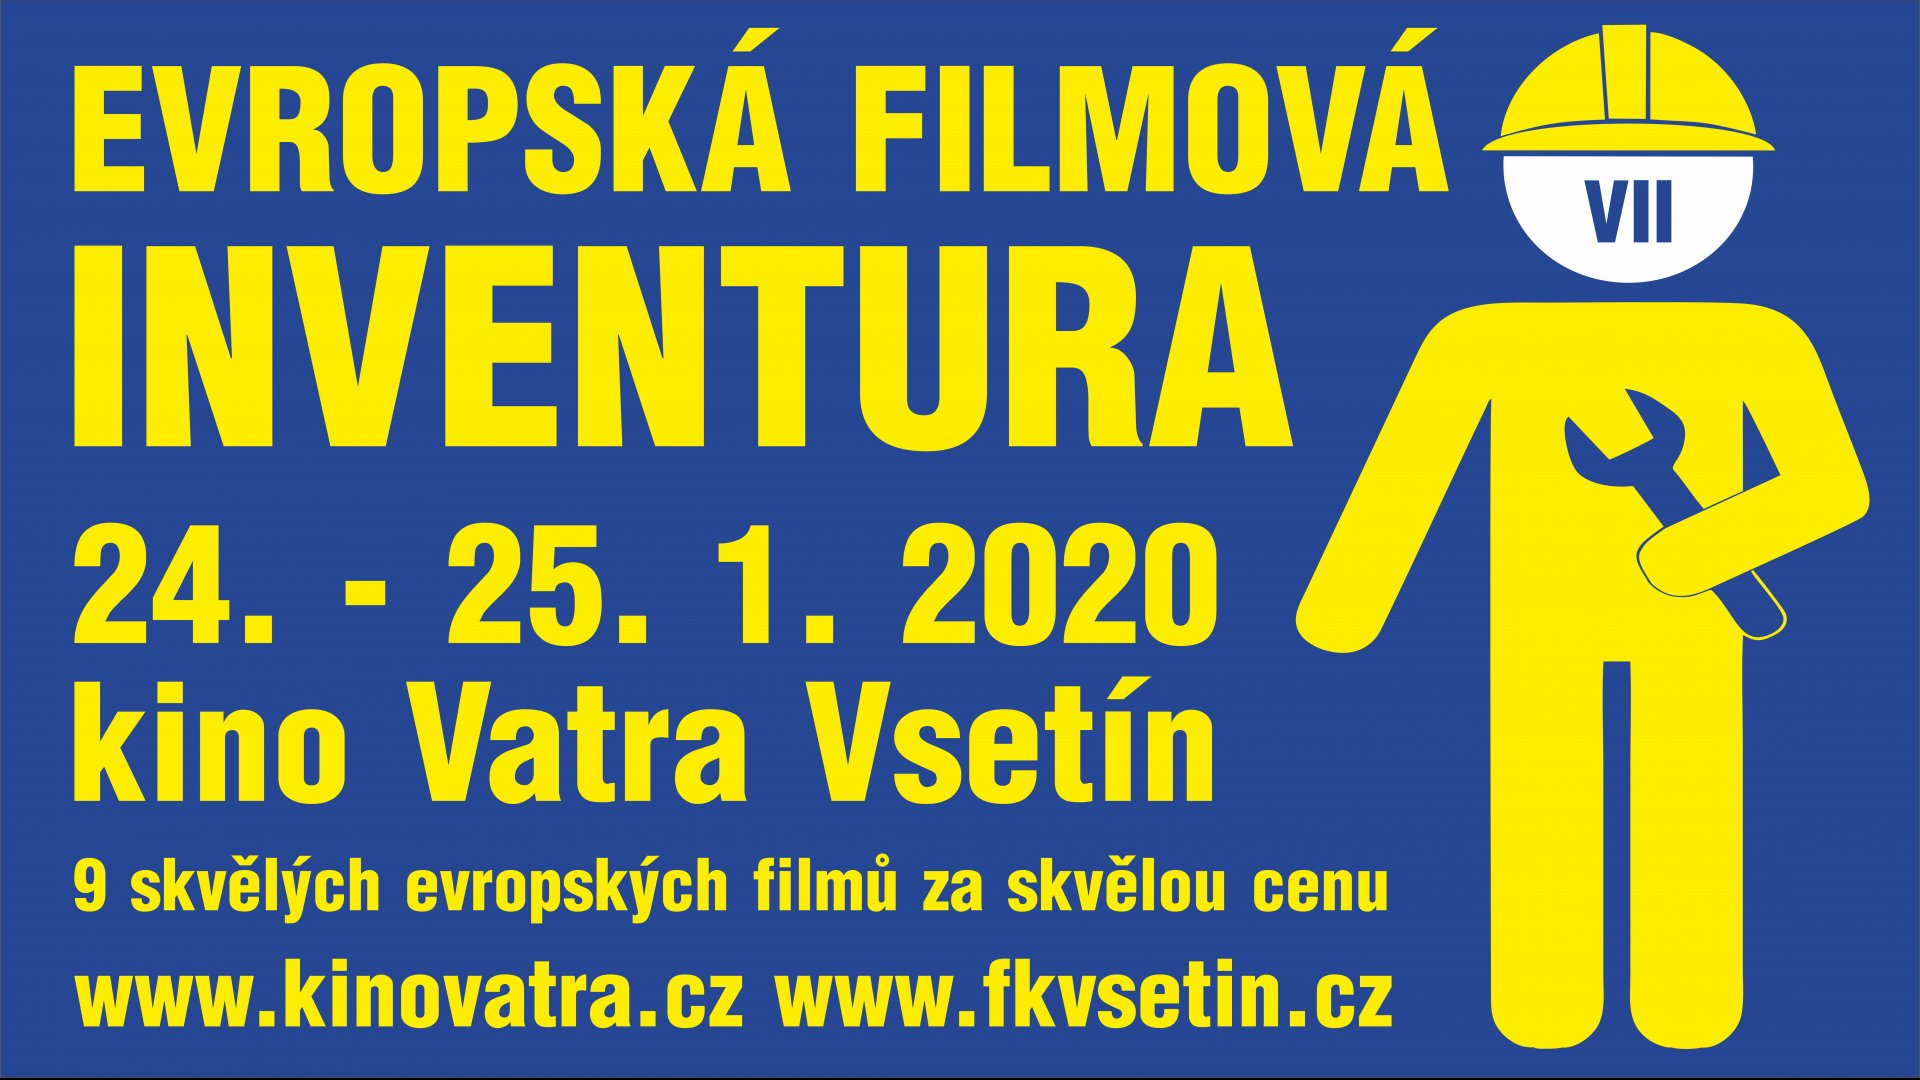 EVROPSKÁ FILMOVÁ INVENTURA 2020